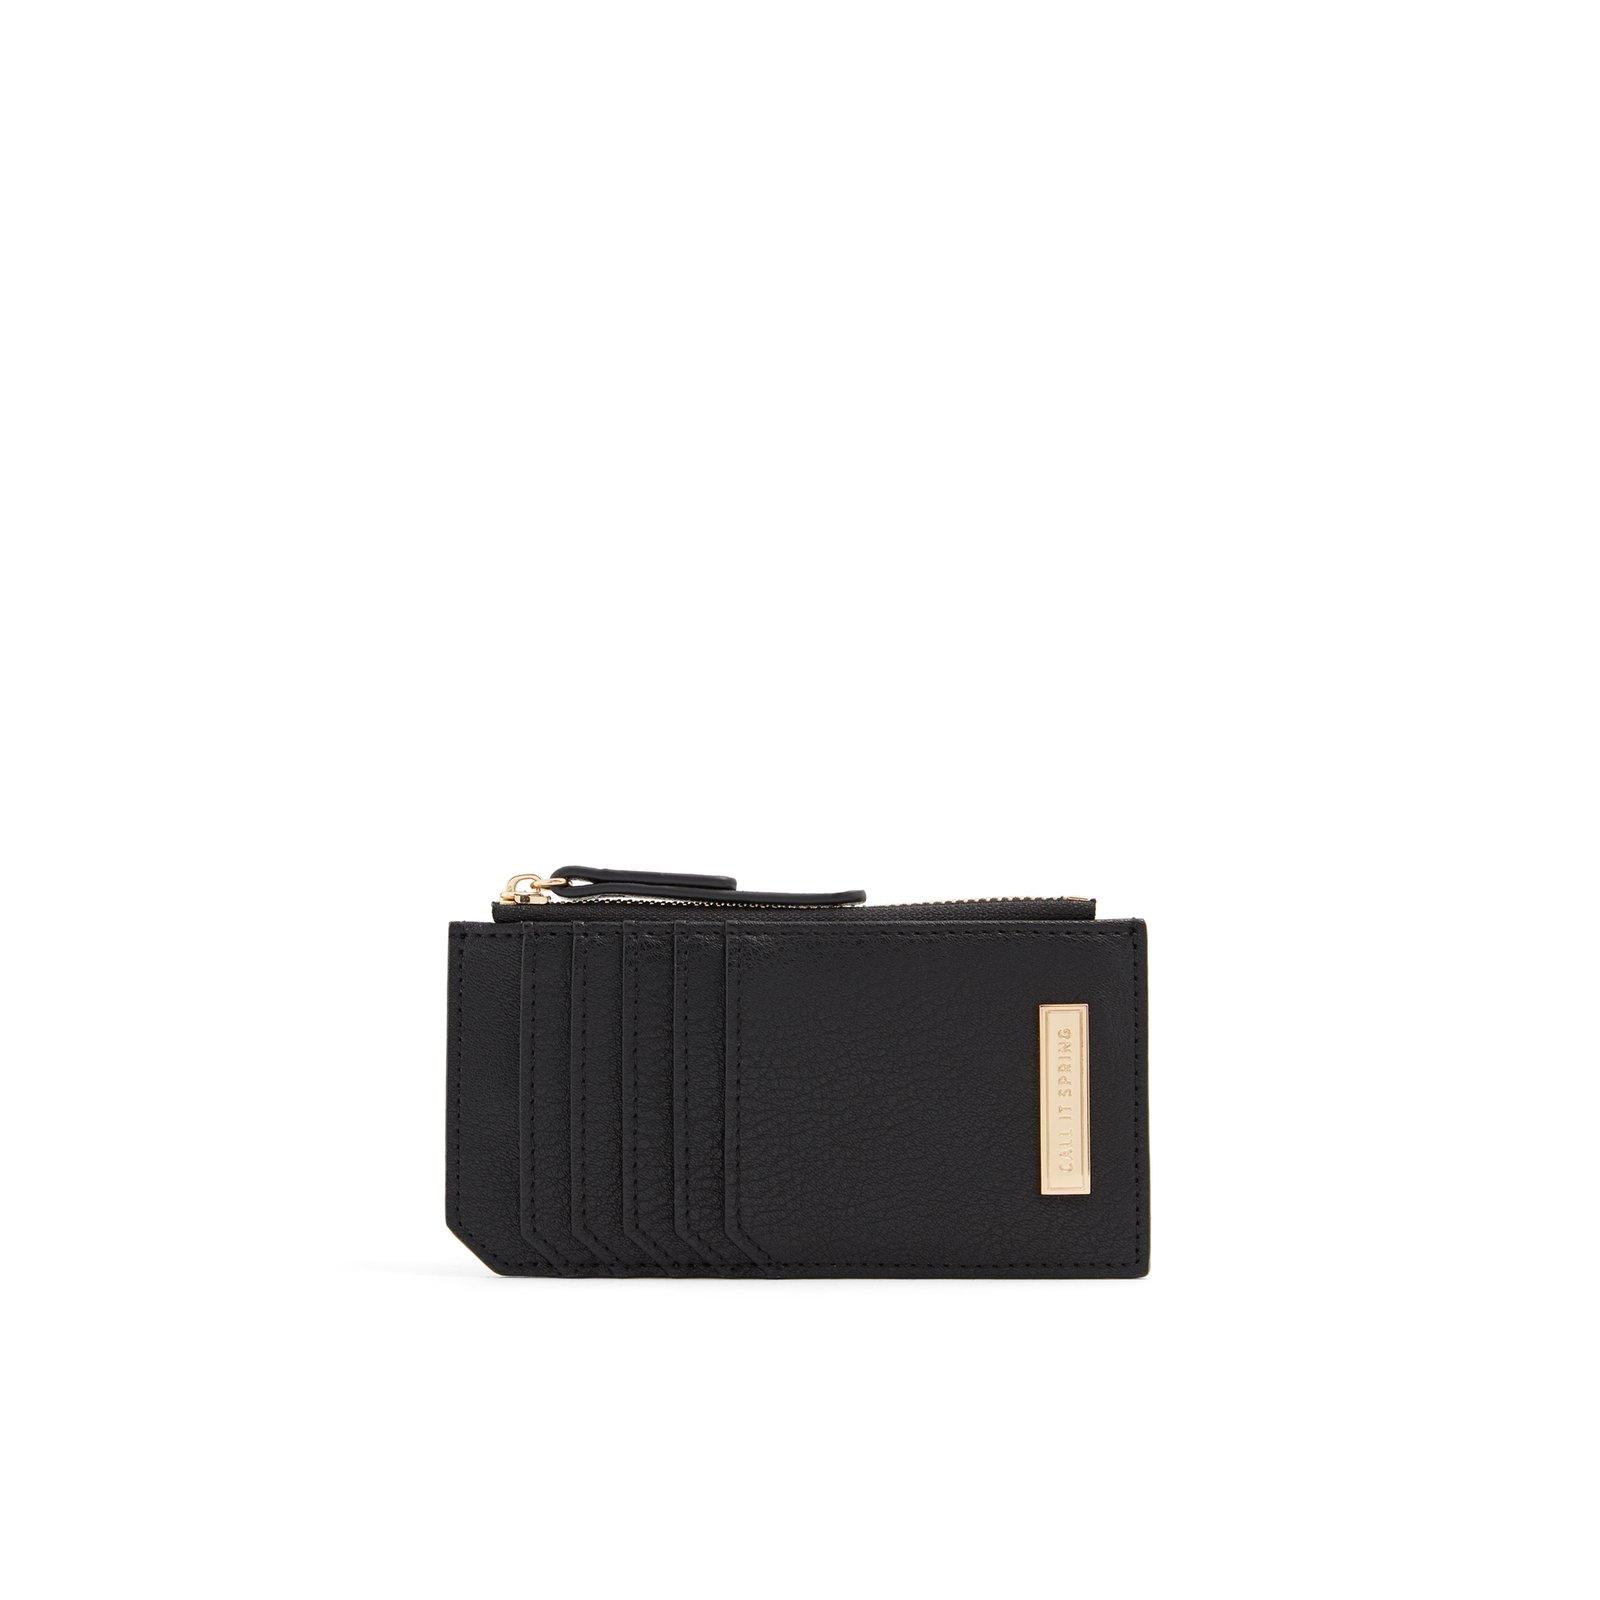 Call It Spring Eroiclya - Women's Handbags Wallets - Black photo